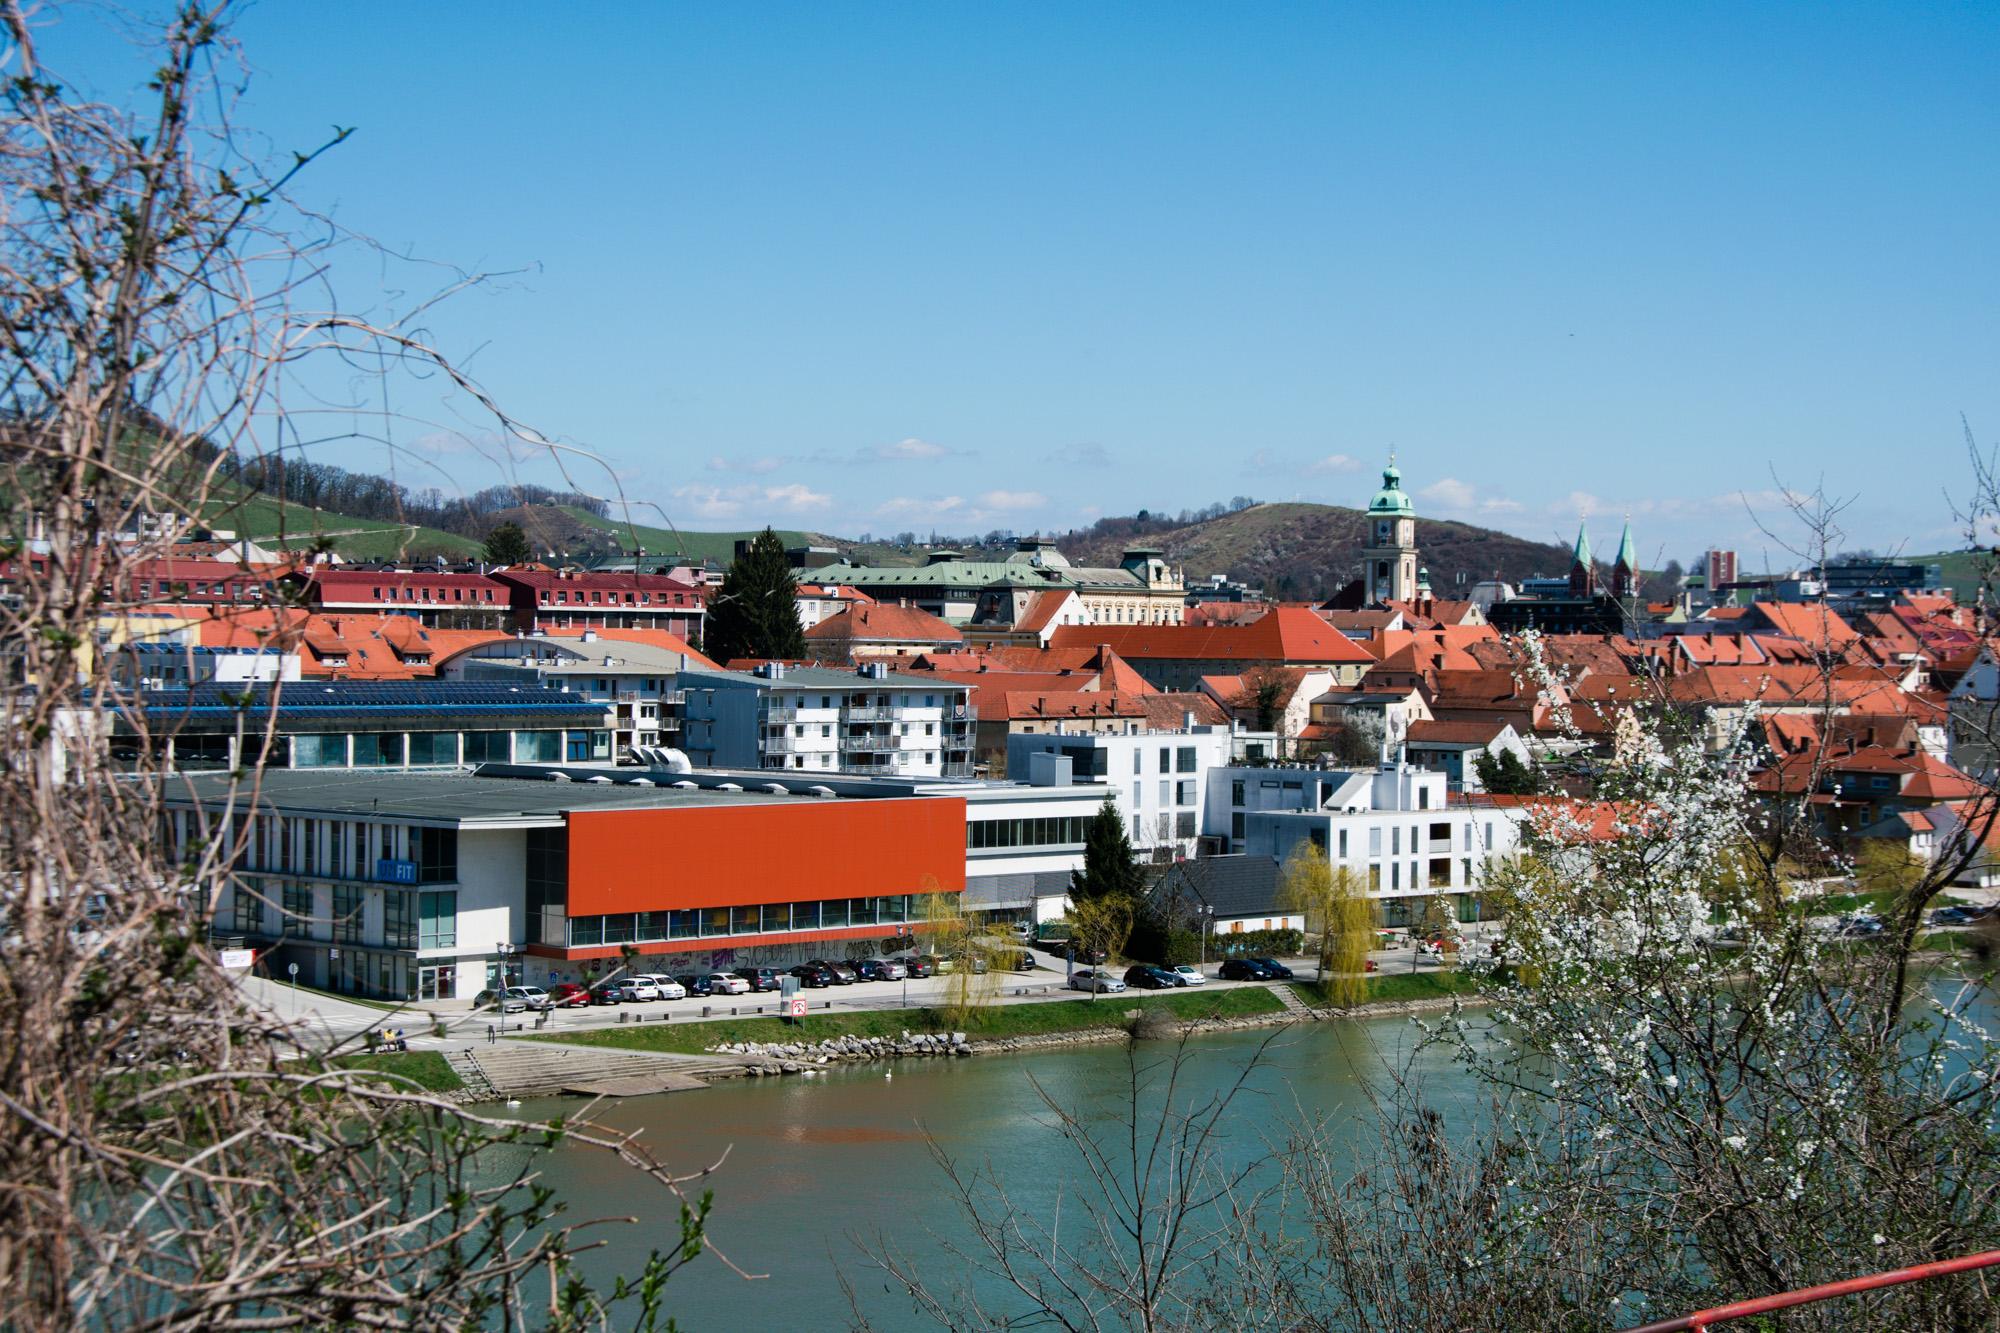 Mariboras